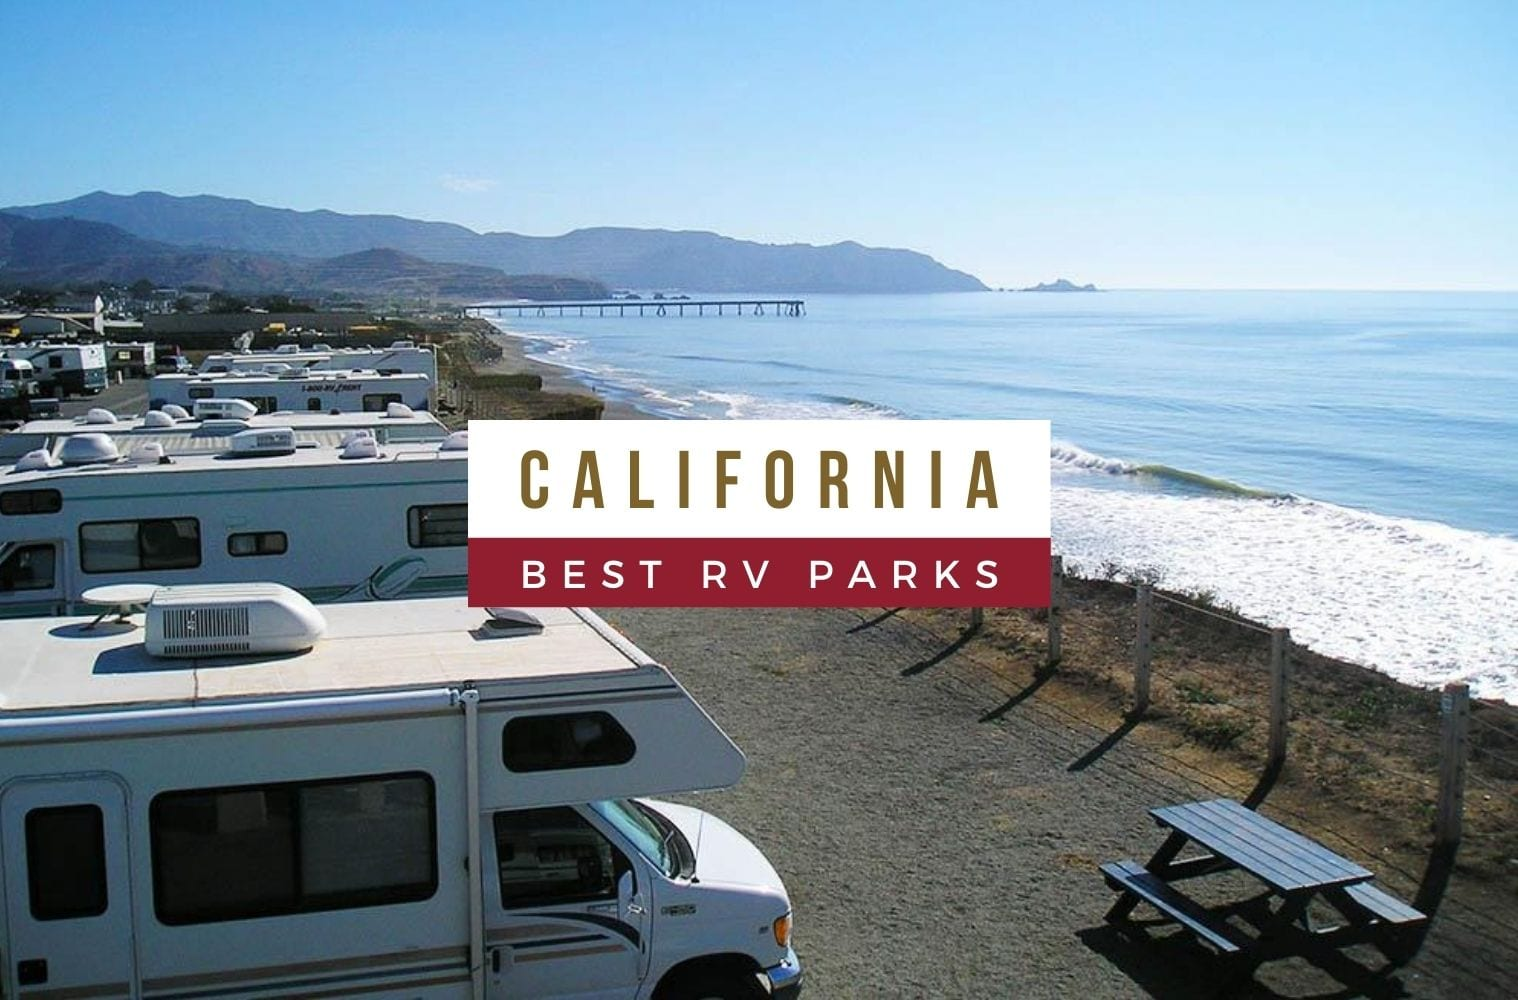 Best RV Parks in California